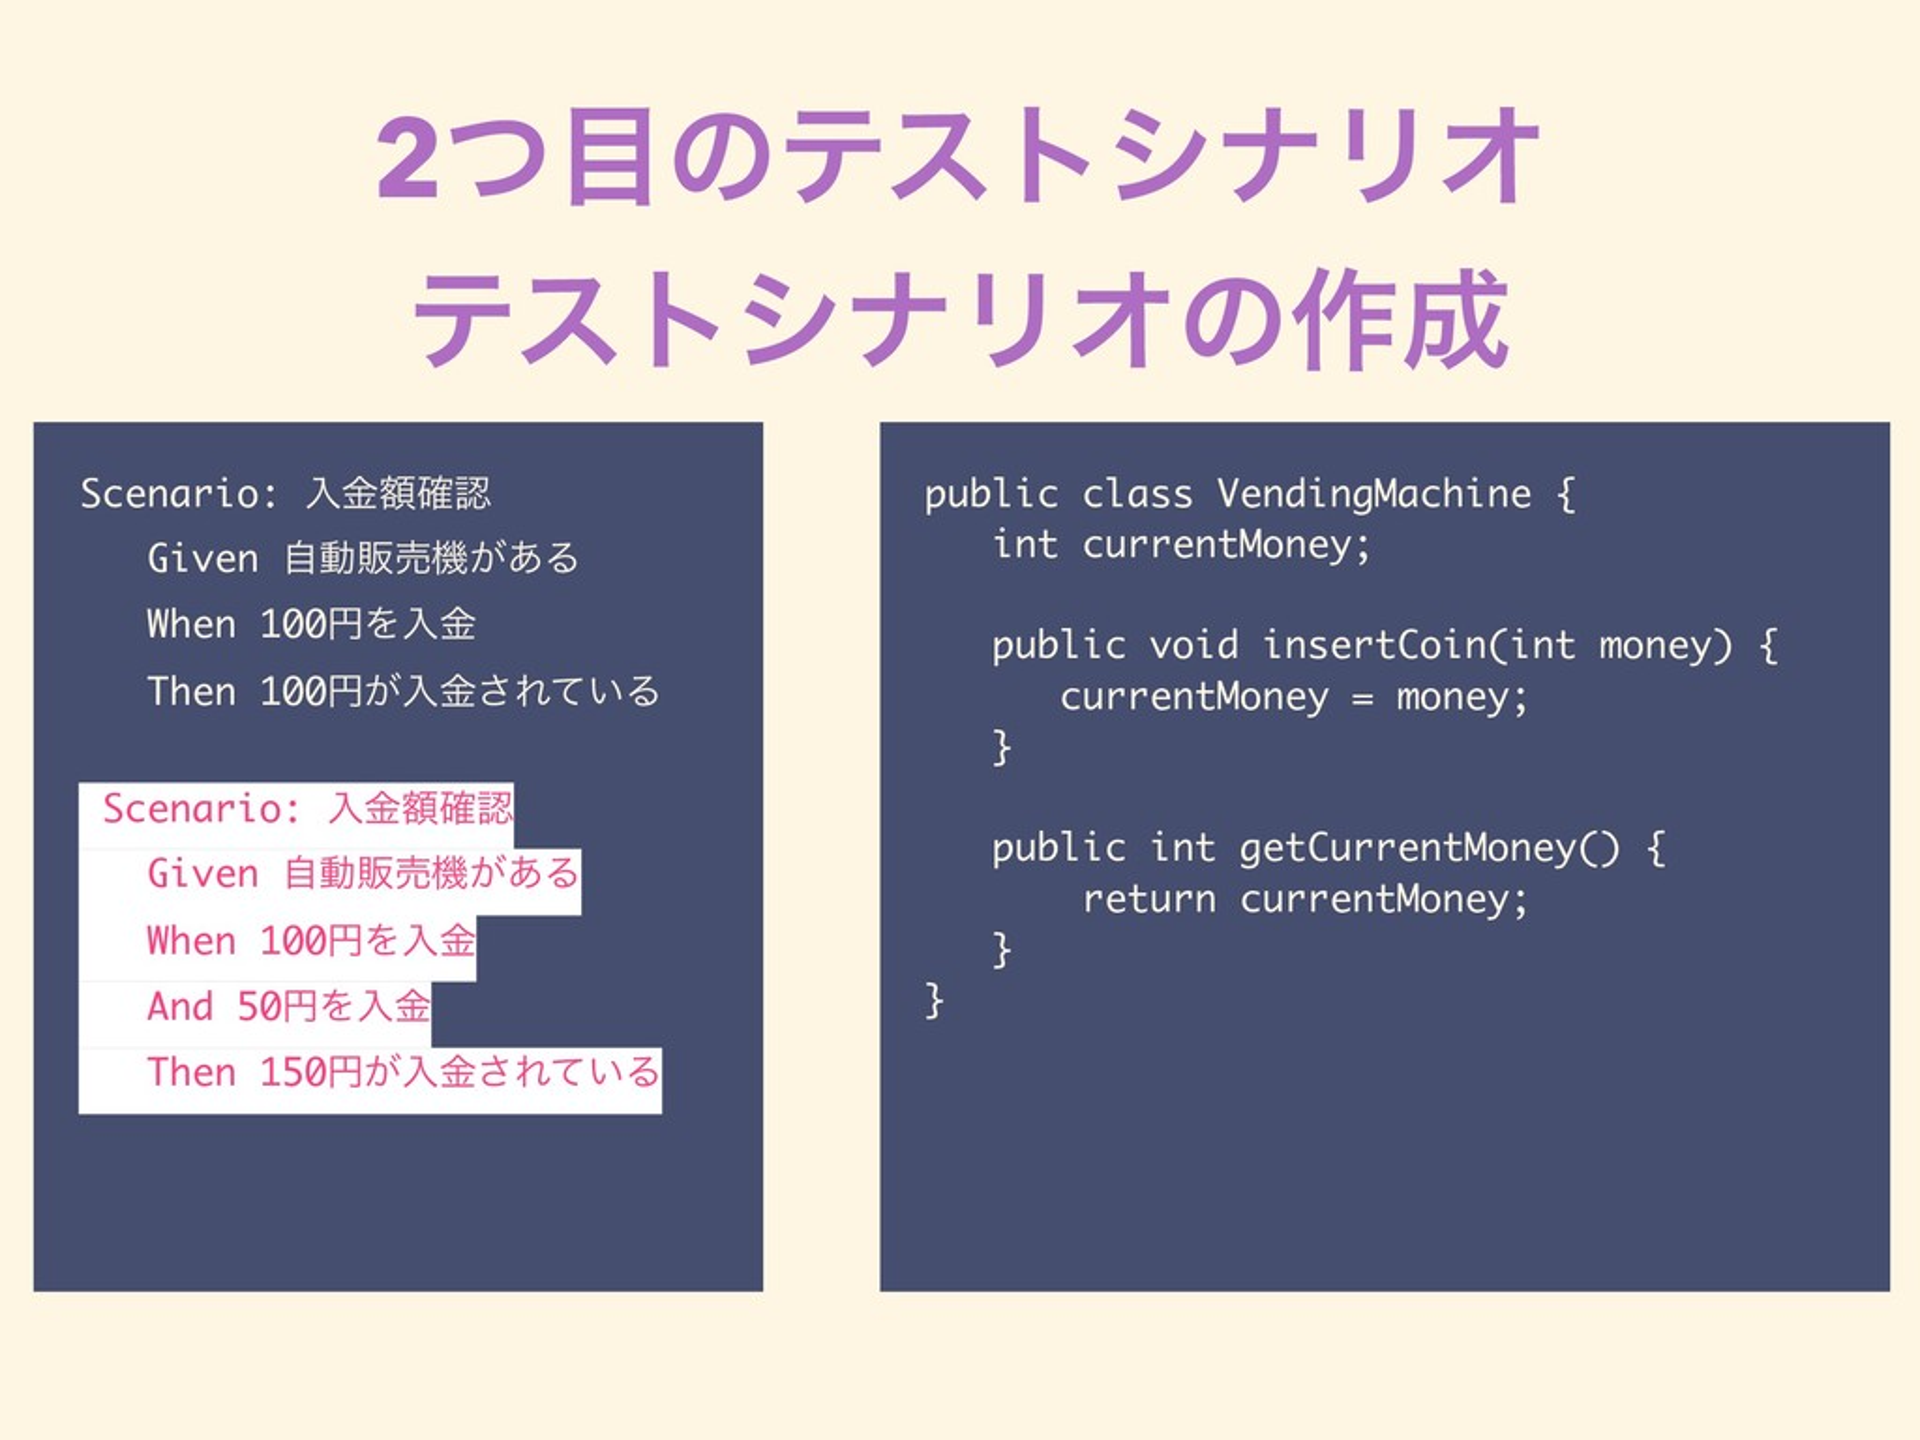 2ͭͷςετγφϦΦ ςετγφϦΦͷ࡞ Scenario: ೖֹۚ֬ Given ࣗಈ...